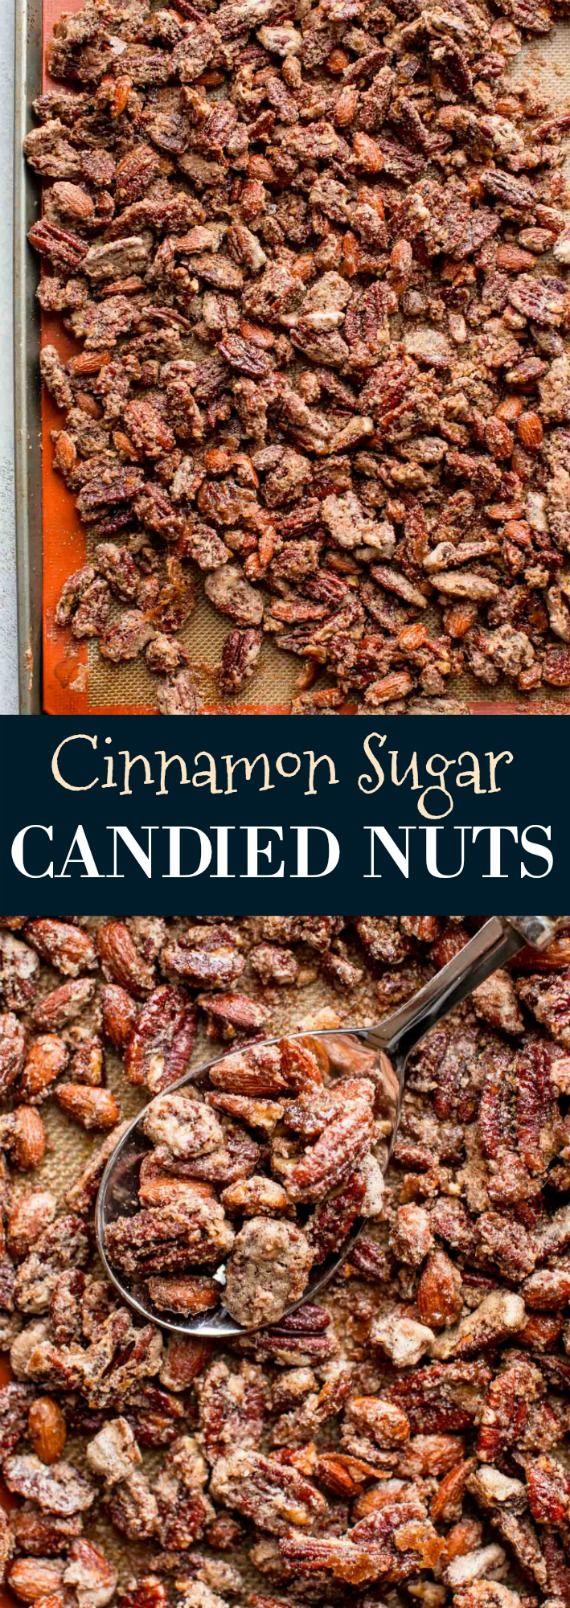 HOLIDAY BOARD: Homemade Cinnamon Sugar Candied Nuts - Sallys Baki...